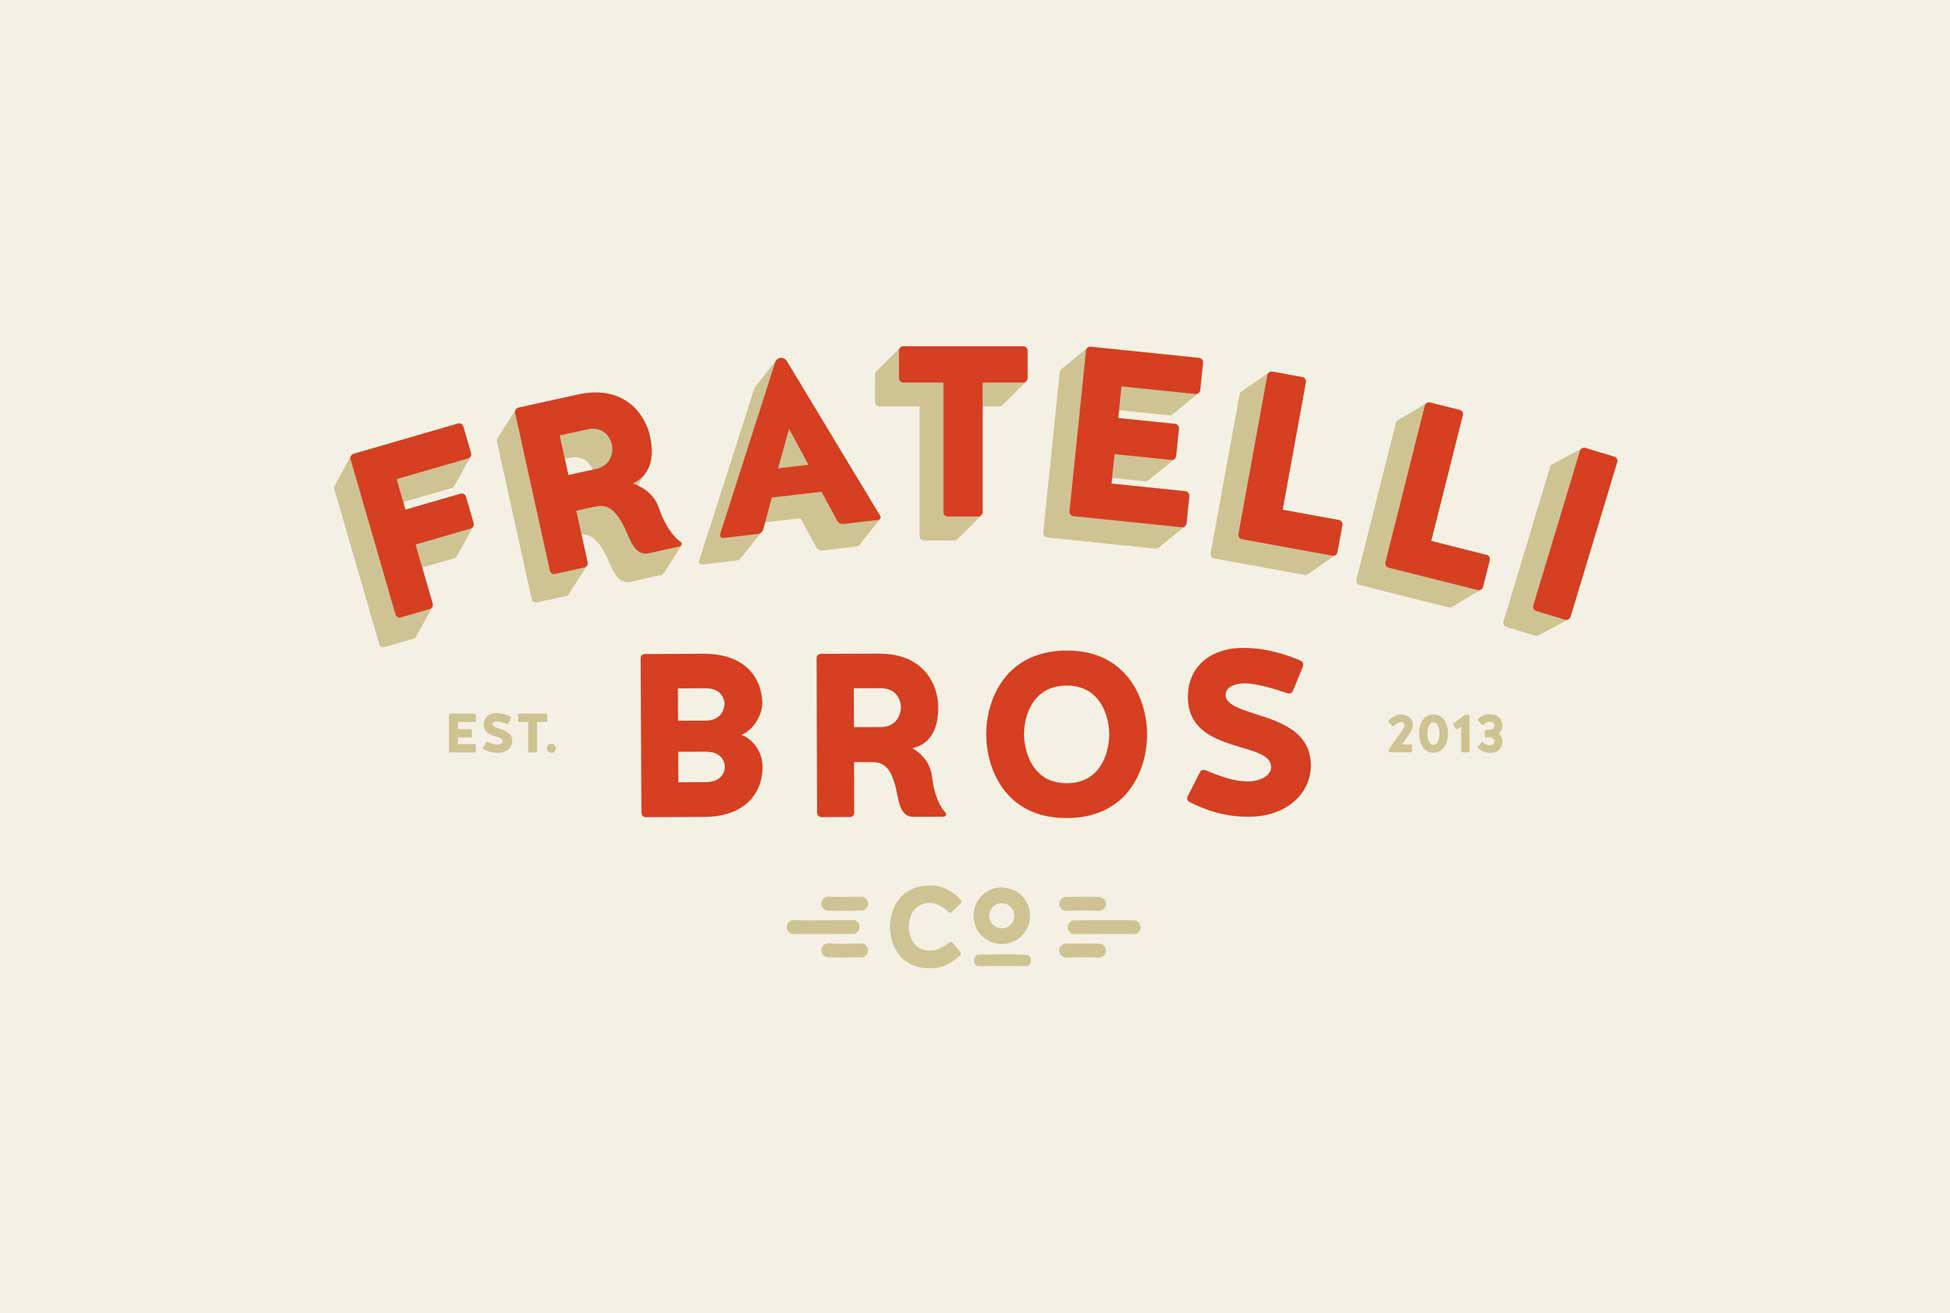 Fratelli Bros Gelato